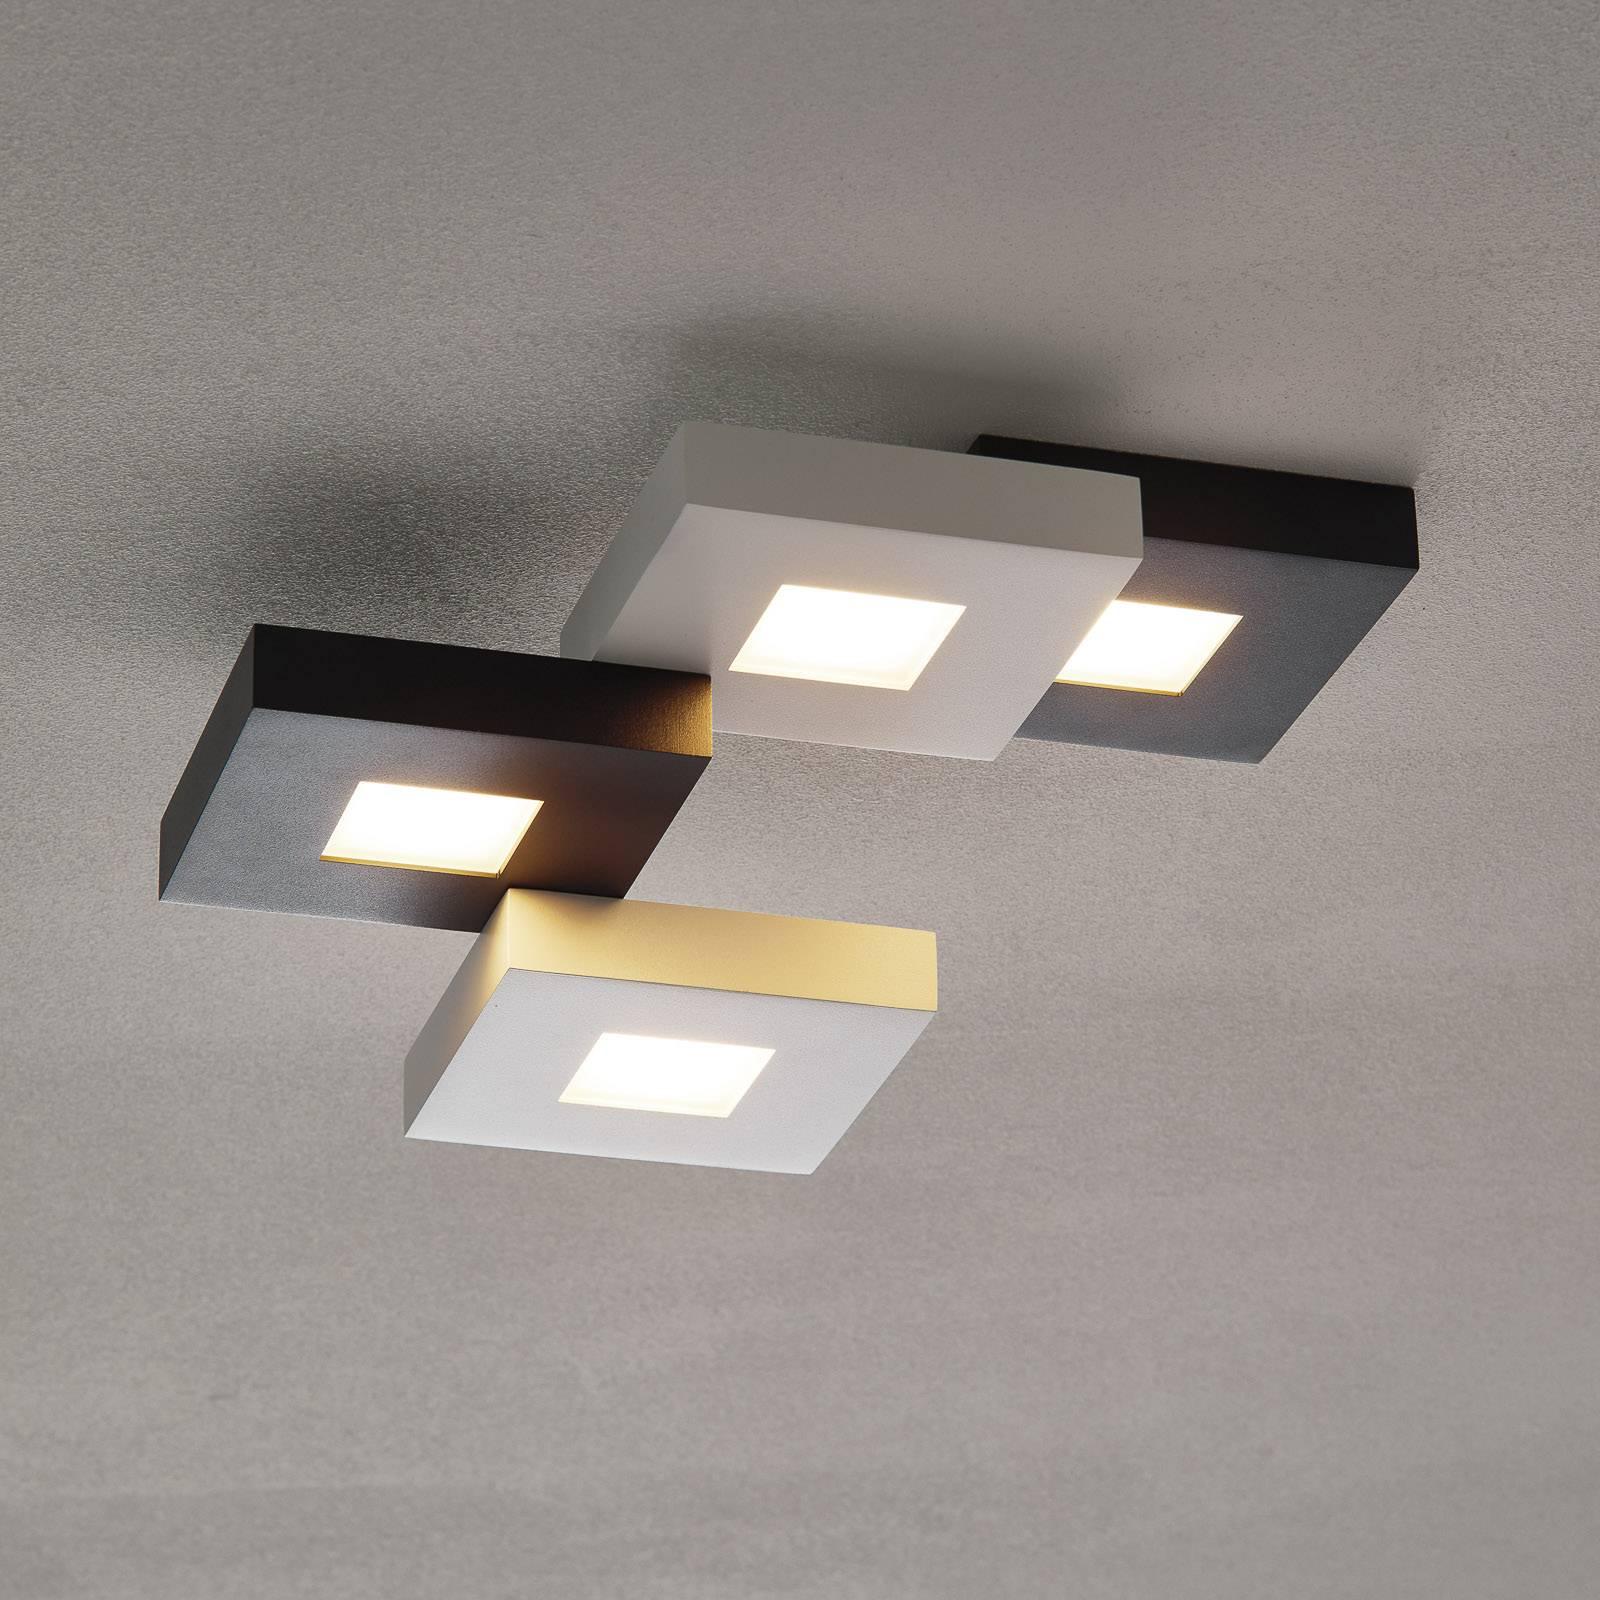 Cubus - LED-plafondlamp in zwart-wit, 4-l.